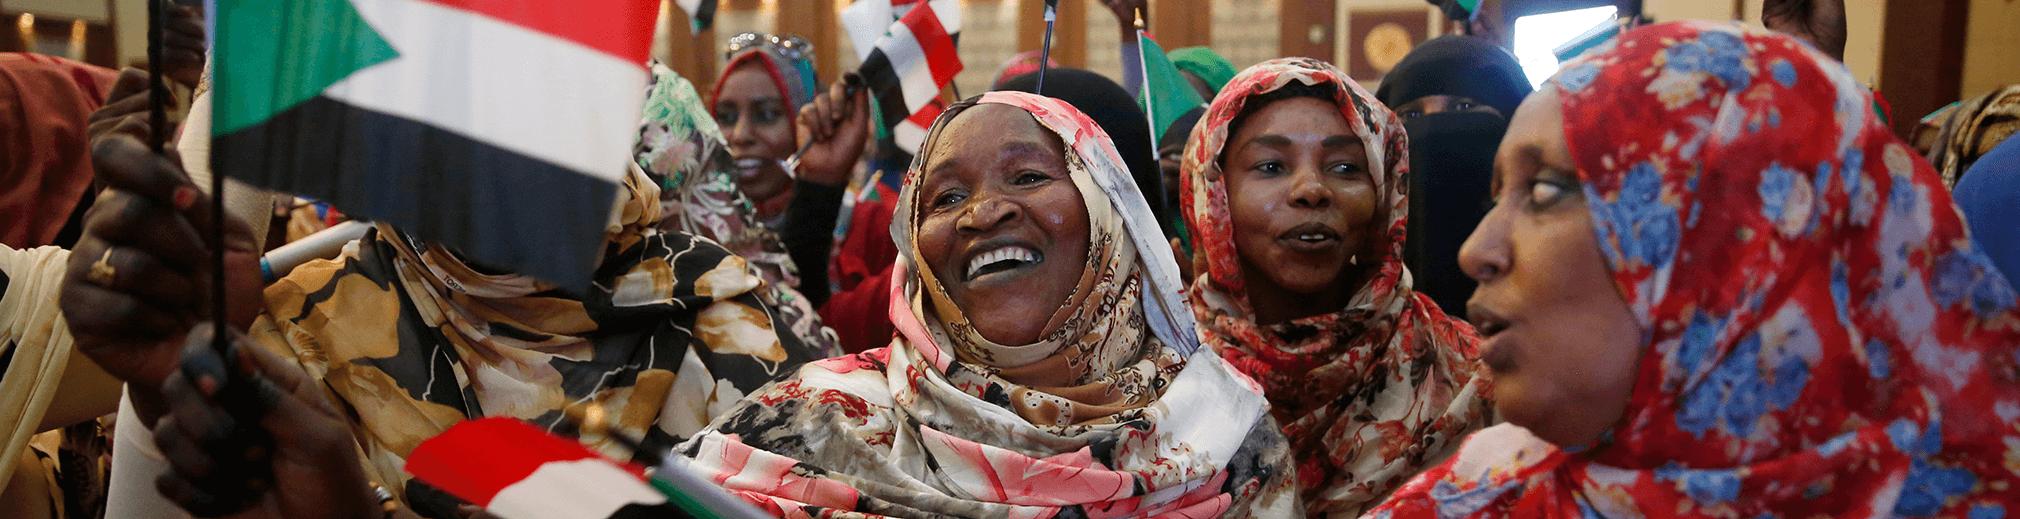 Sudan Womens